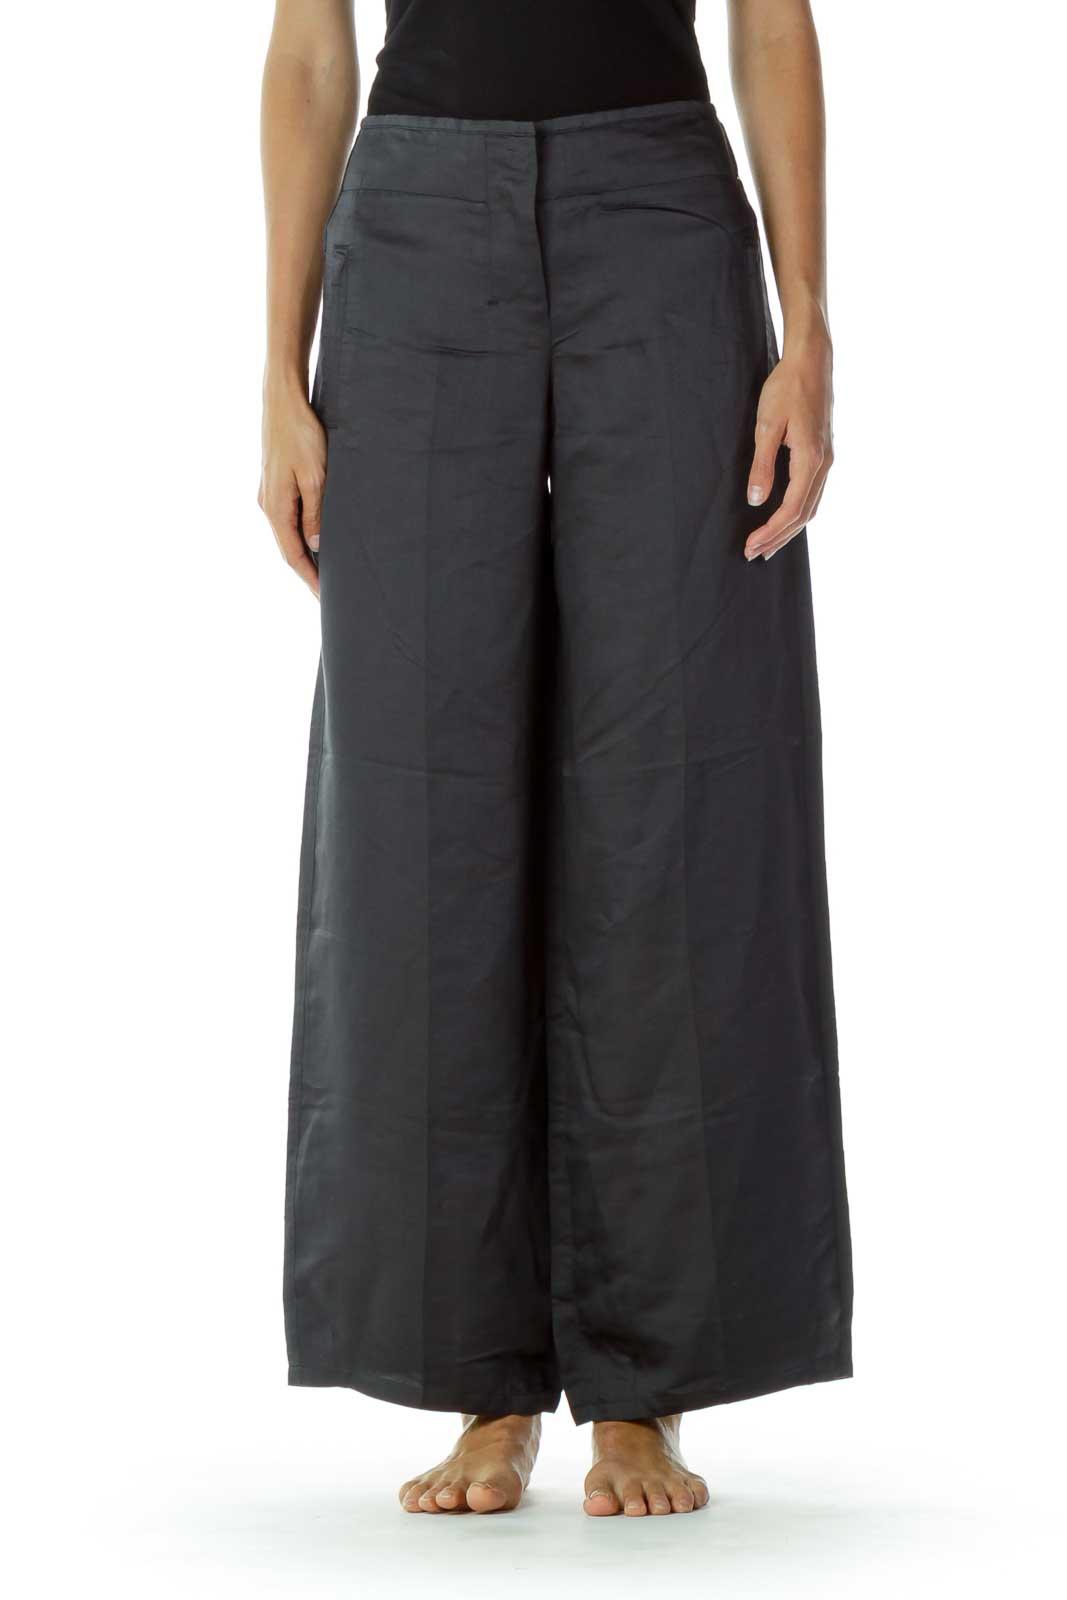 Gray Wide-Leg Pants Front